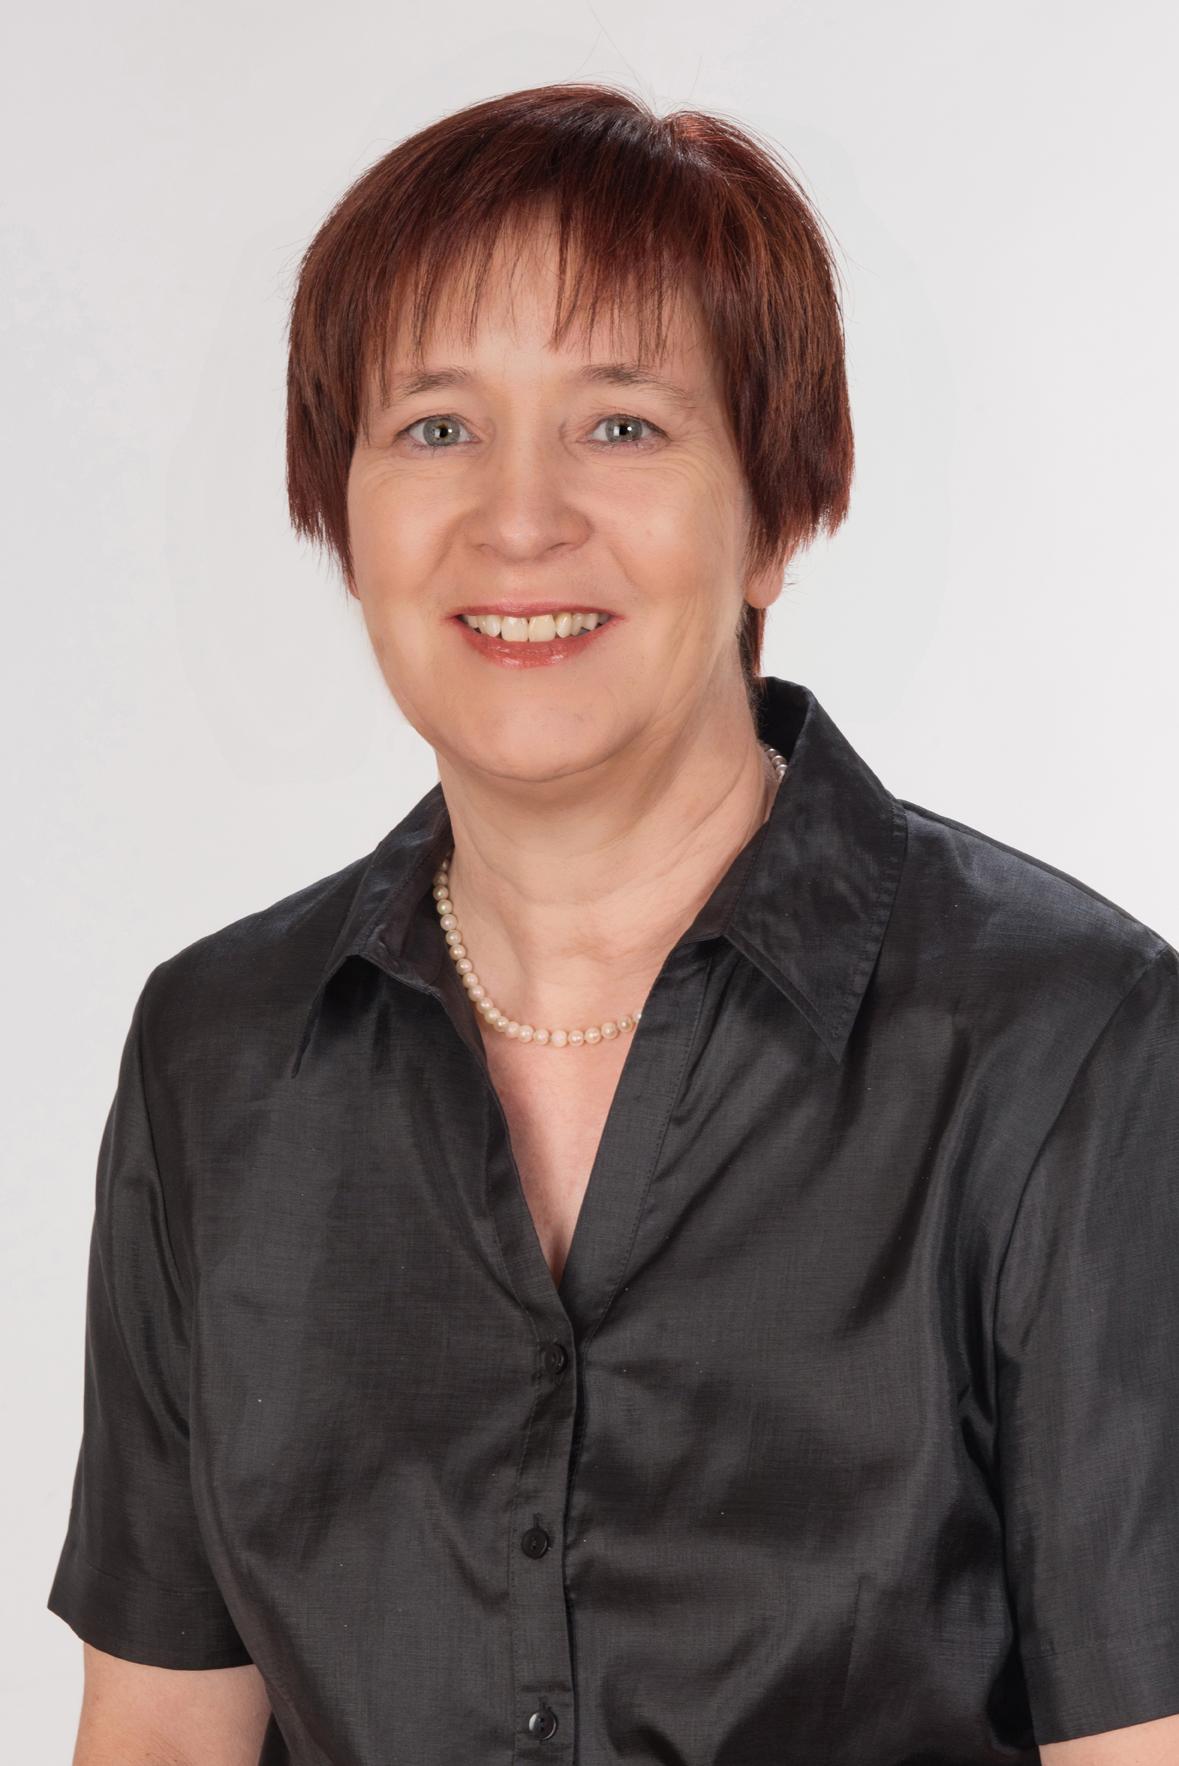 Carola Dunst